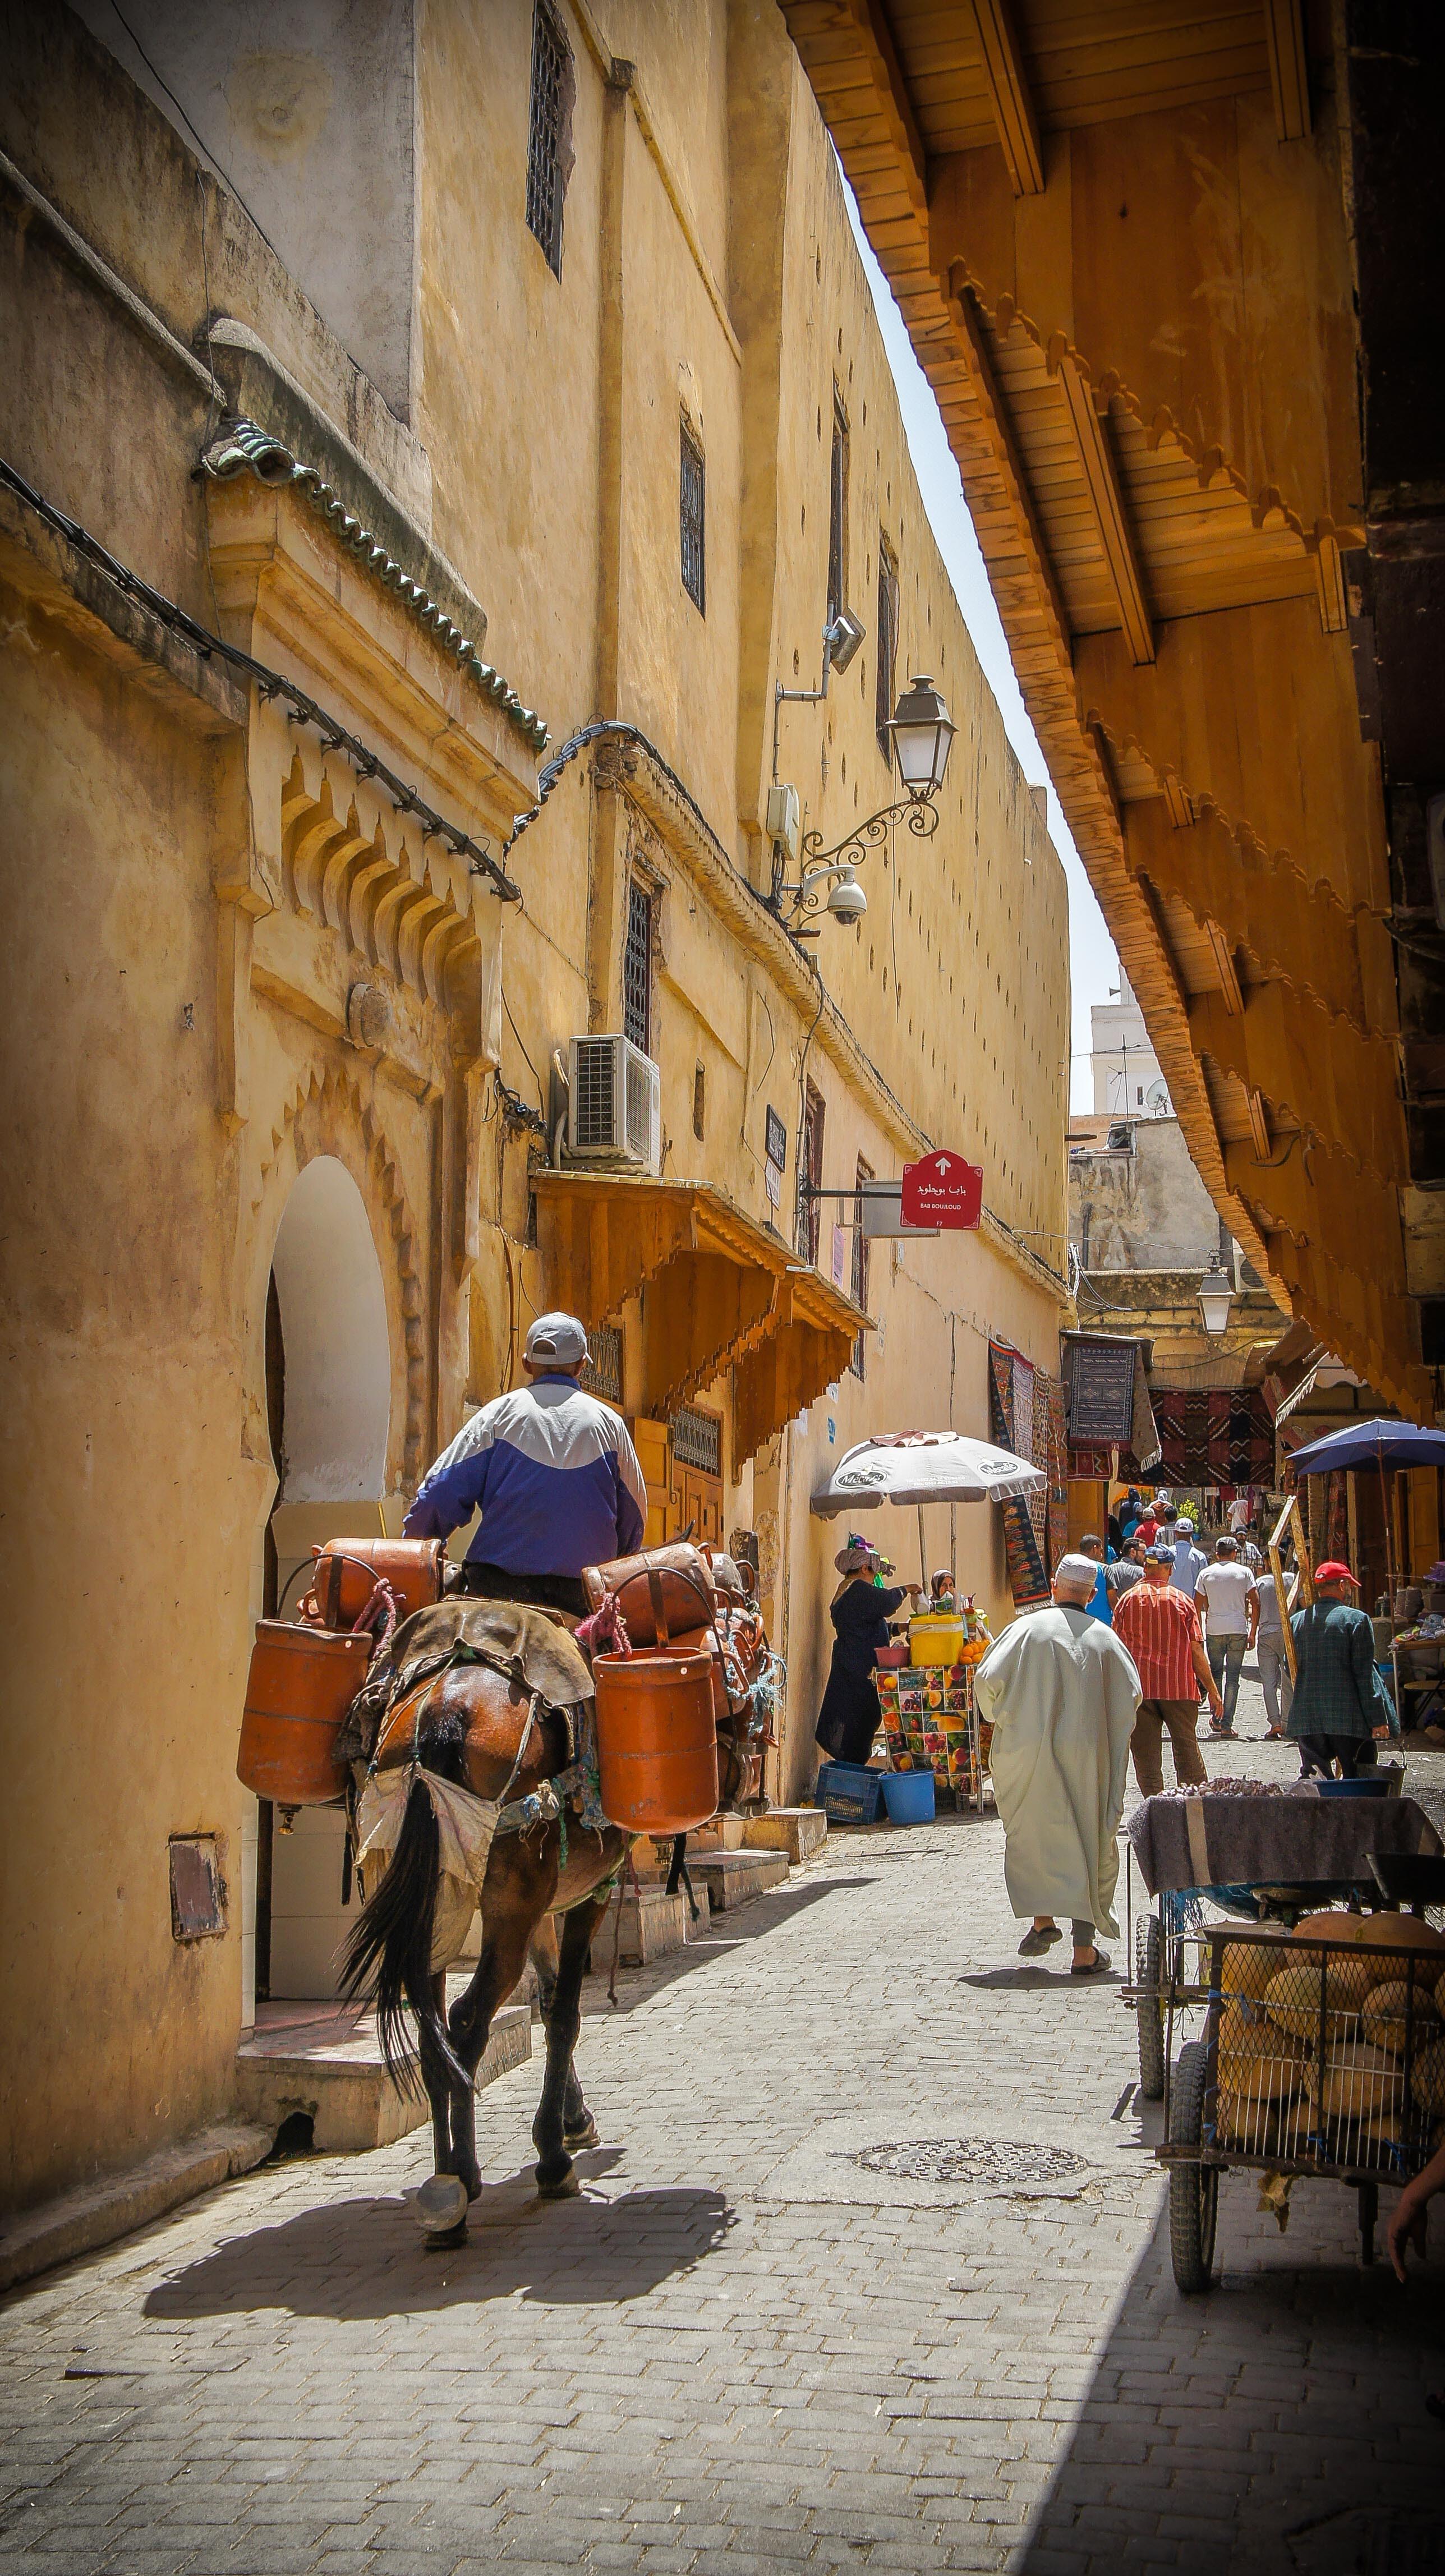 Morocco street with donkey